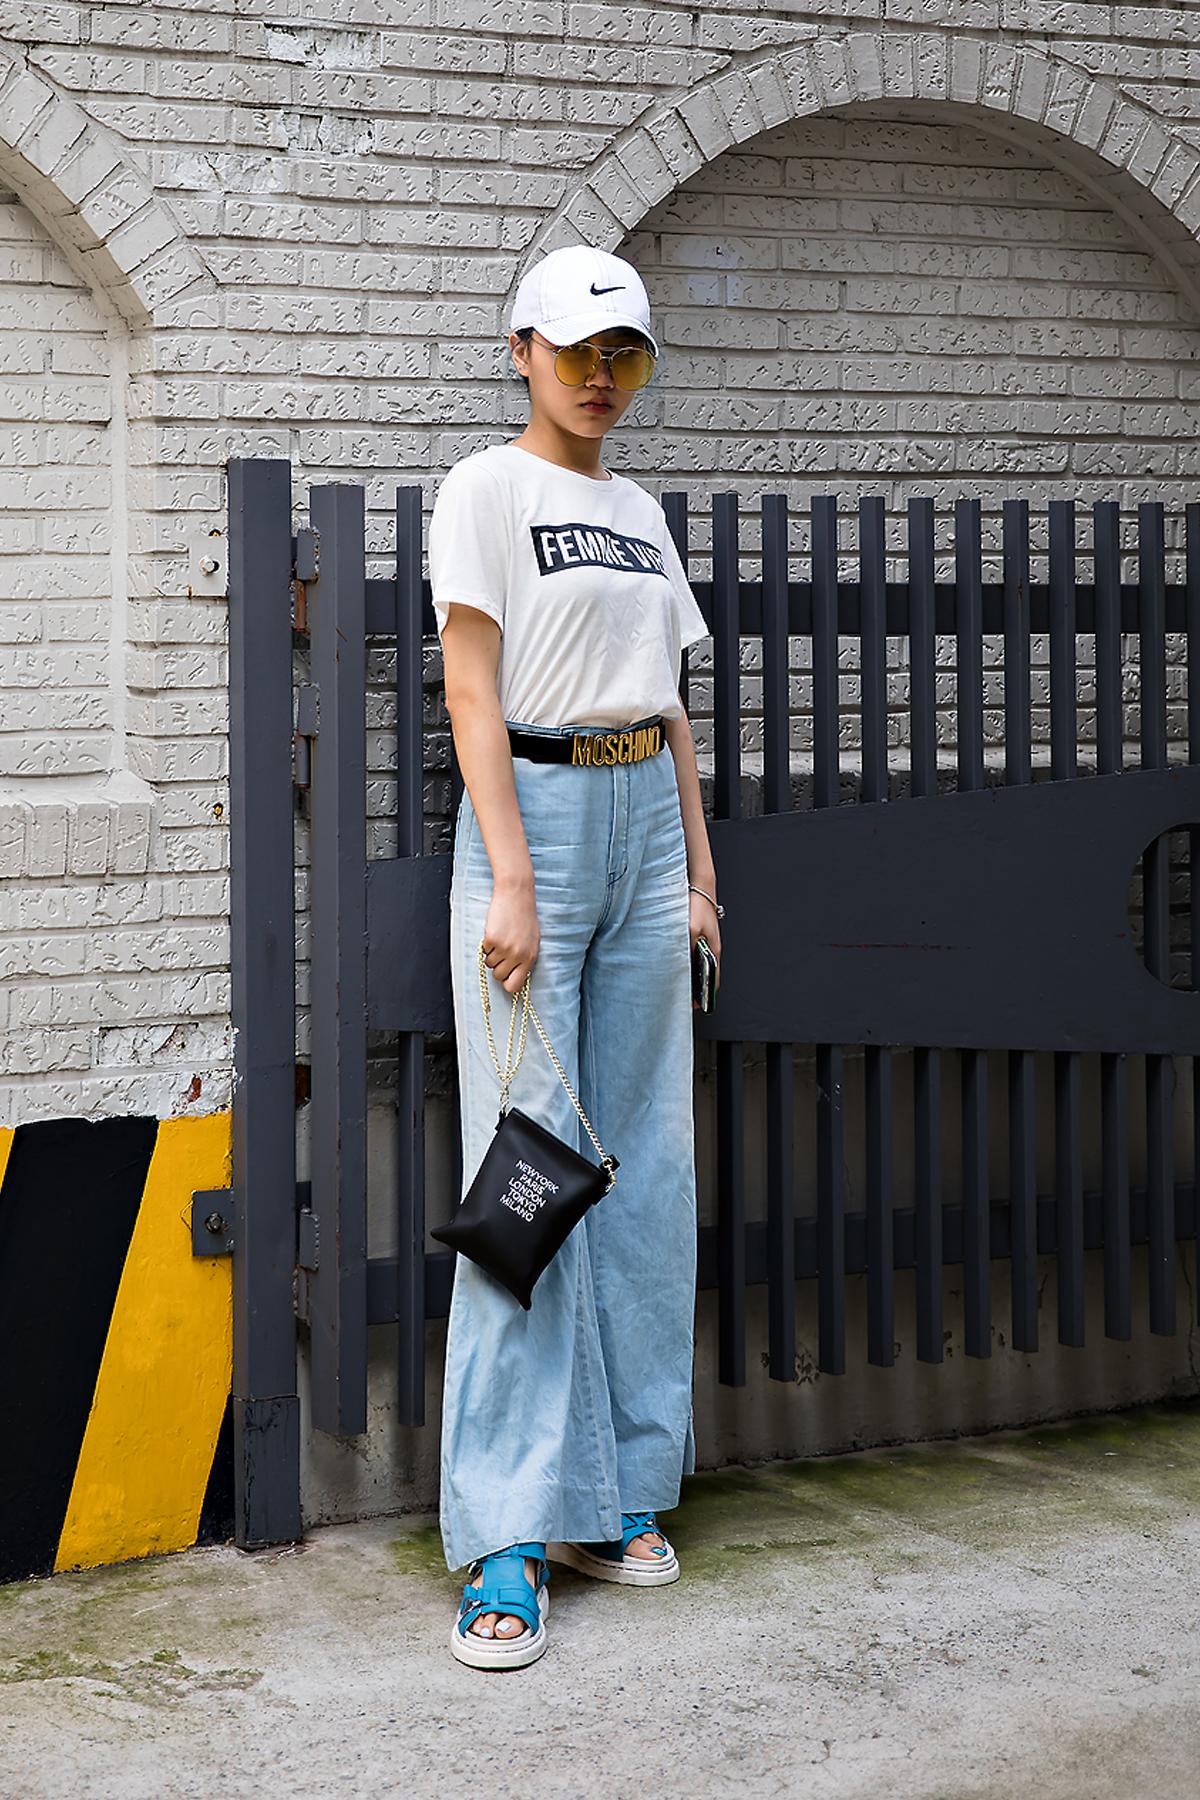 TS, Street Fashion 2017 in Seoul.jpg